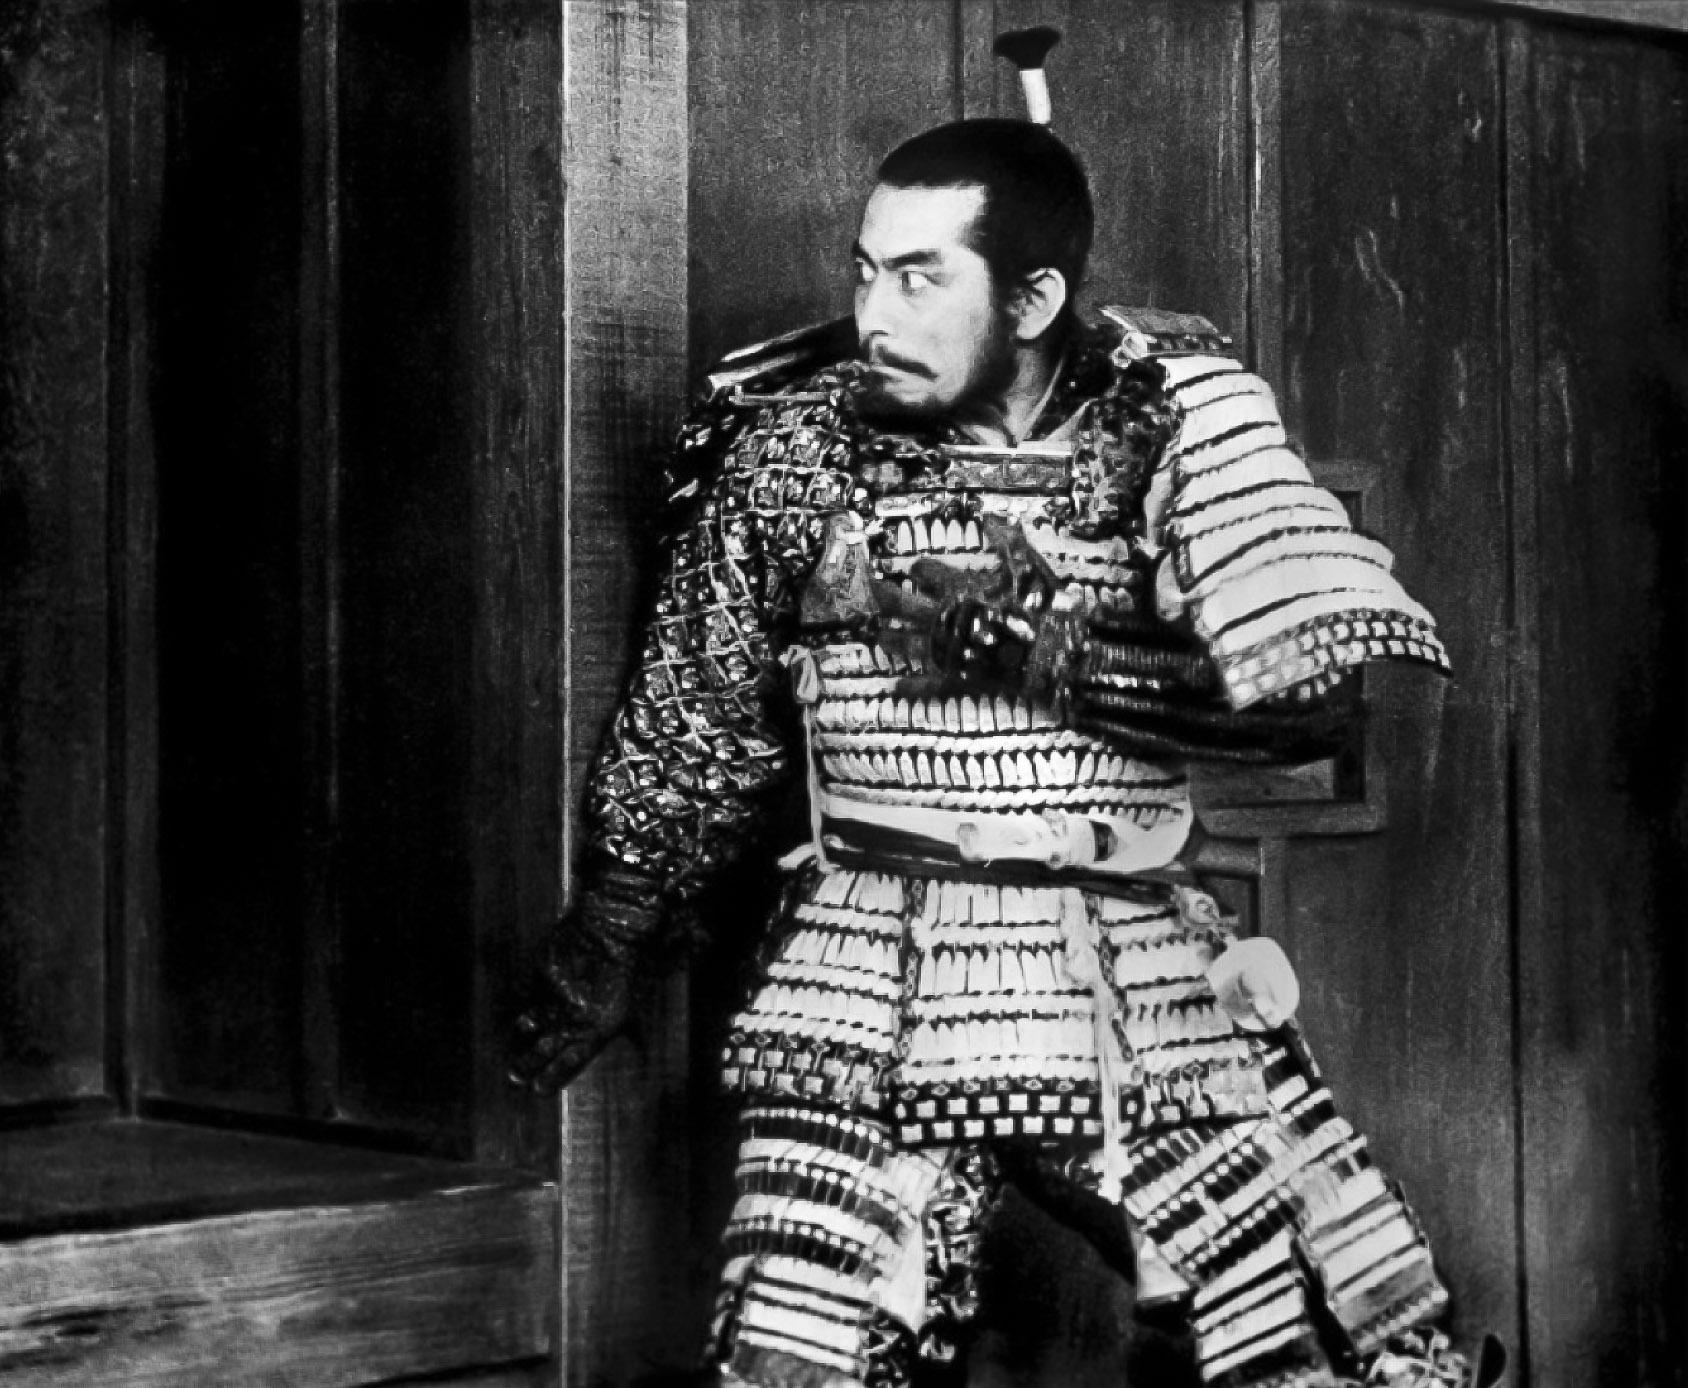 HD Quality Wallpaper   Collection: Artistic, 1688x1388 Toshiro Mifune